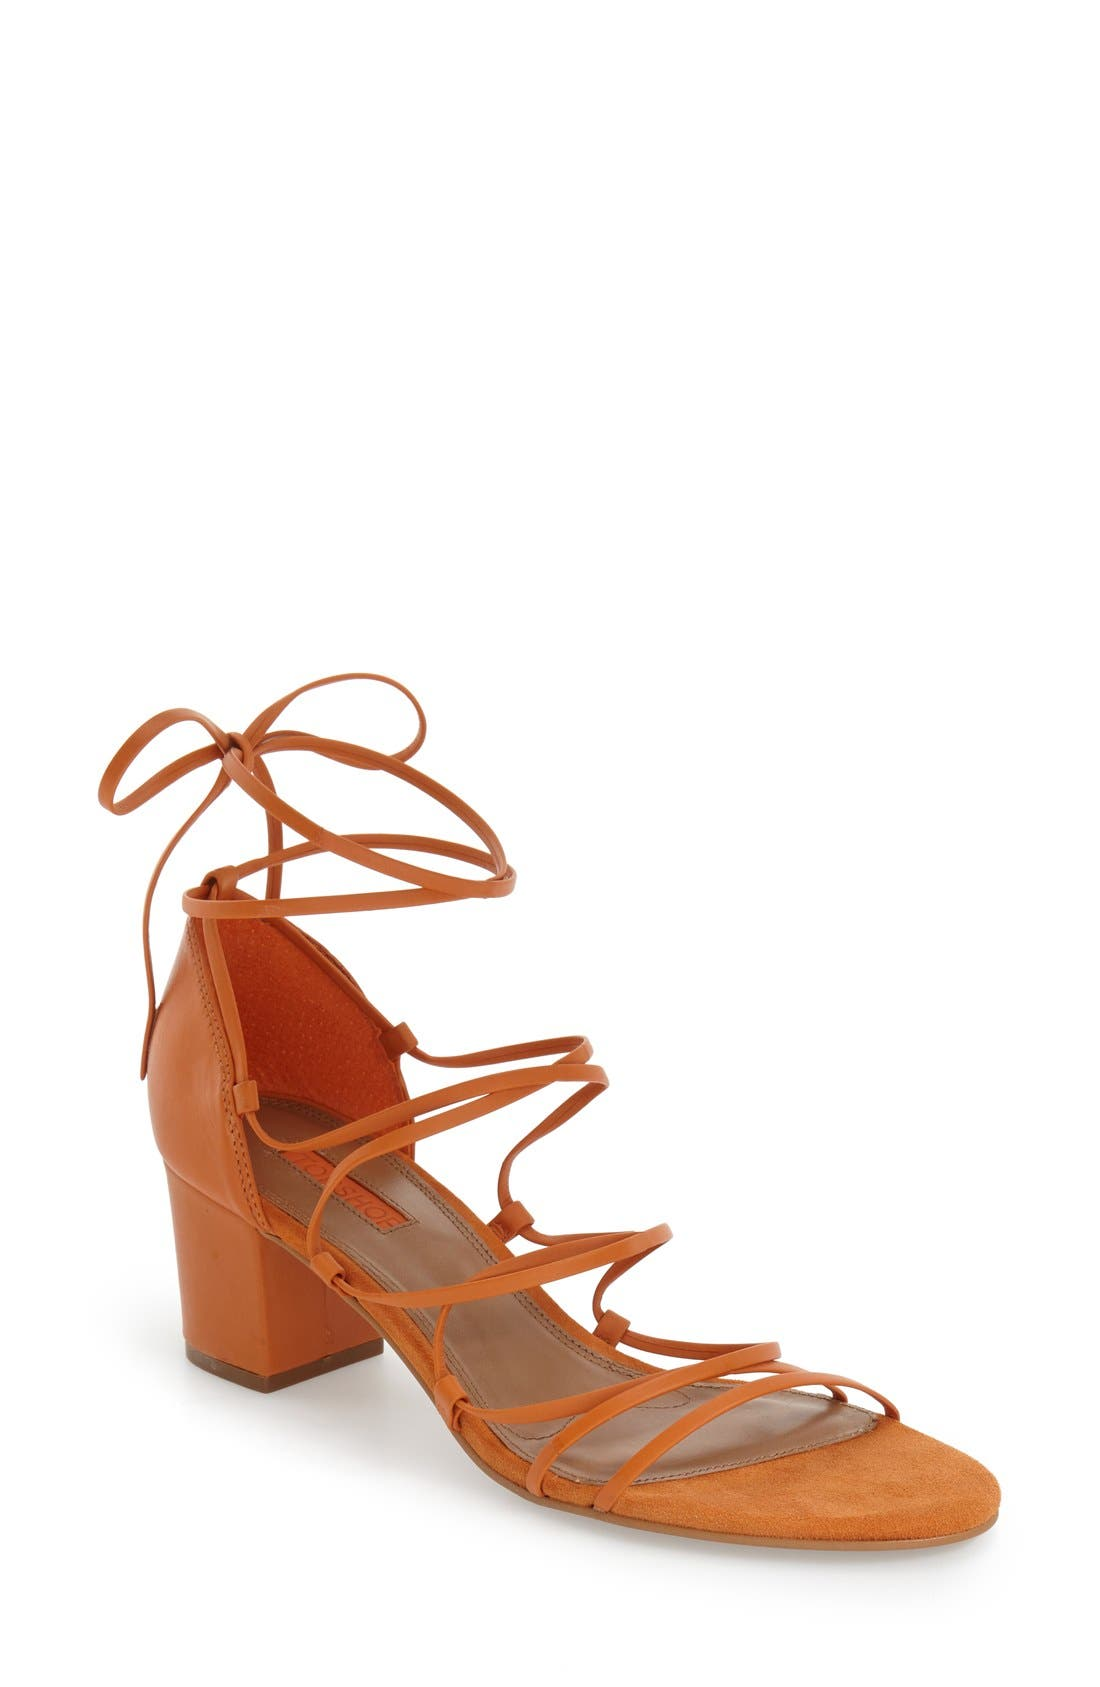 Alternate Image 1 Selected - Topshop Strappy Block Heel Sandal (Women)